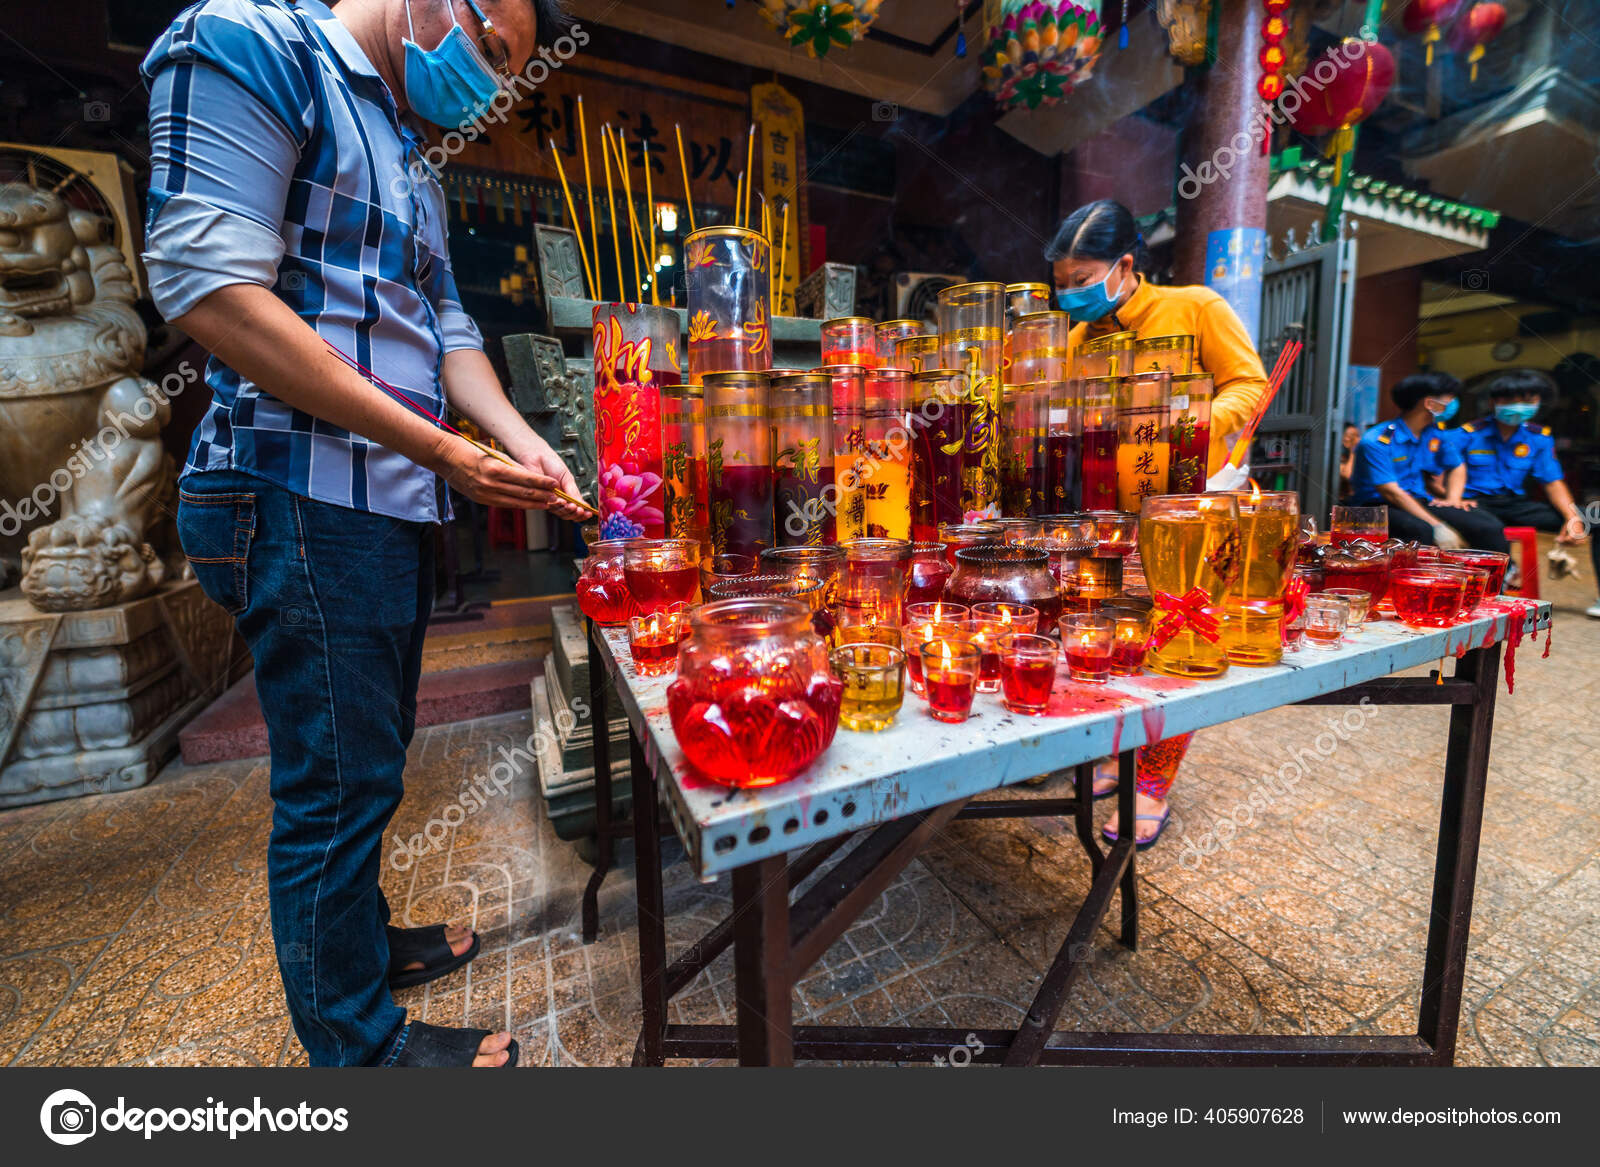 Chi Minh Vietnam Aug 2020 People Visit Thousand Buddha Temple — Stock Photo, Image